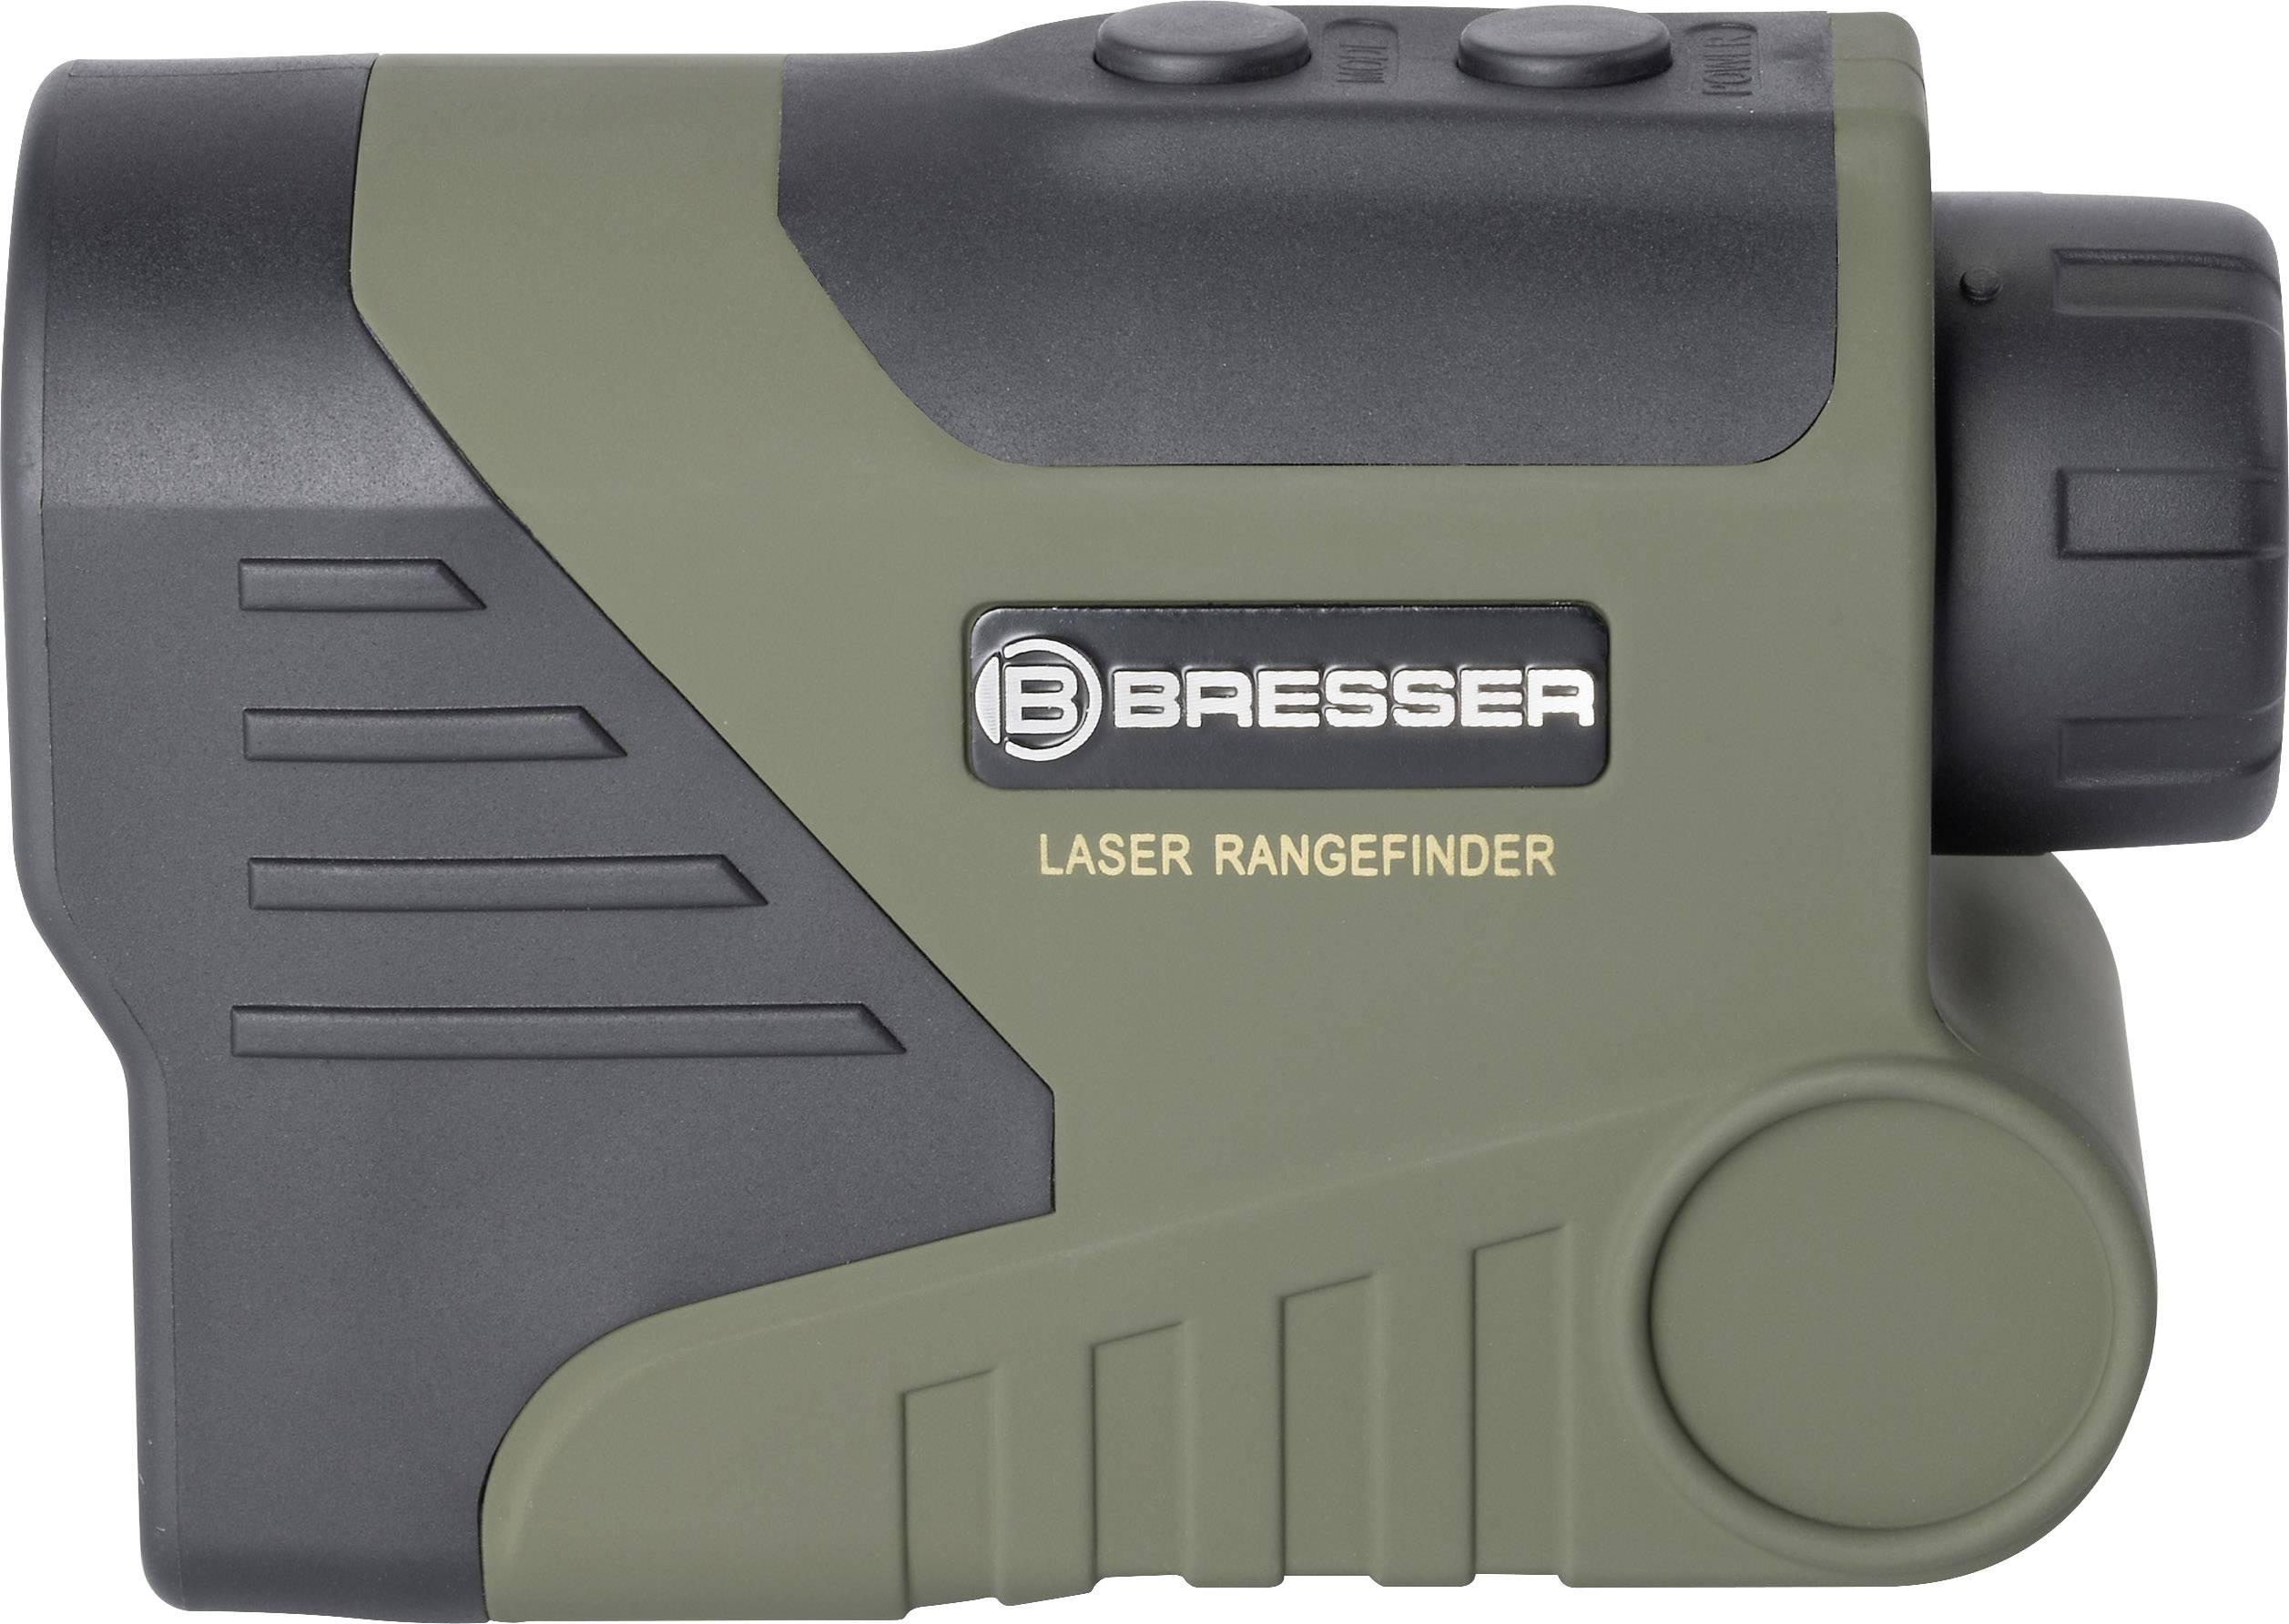 Entfernungsmesser Bresser : Entfernungsmesser bresser optik wp oled m grün kaufen